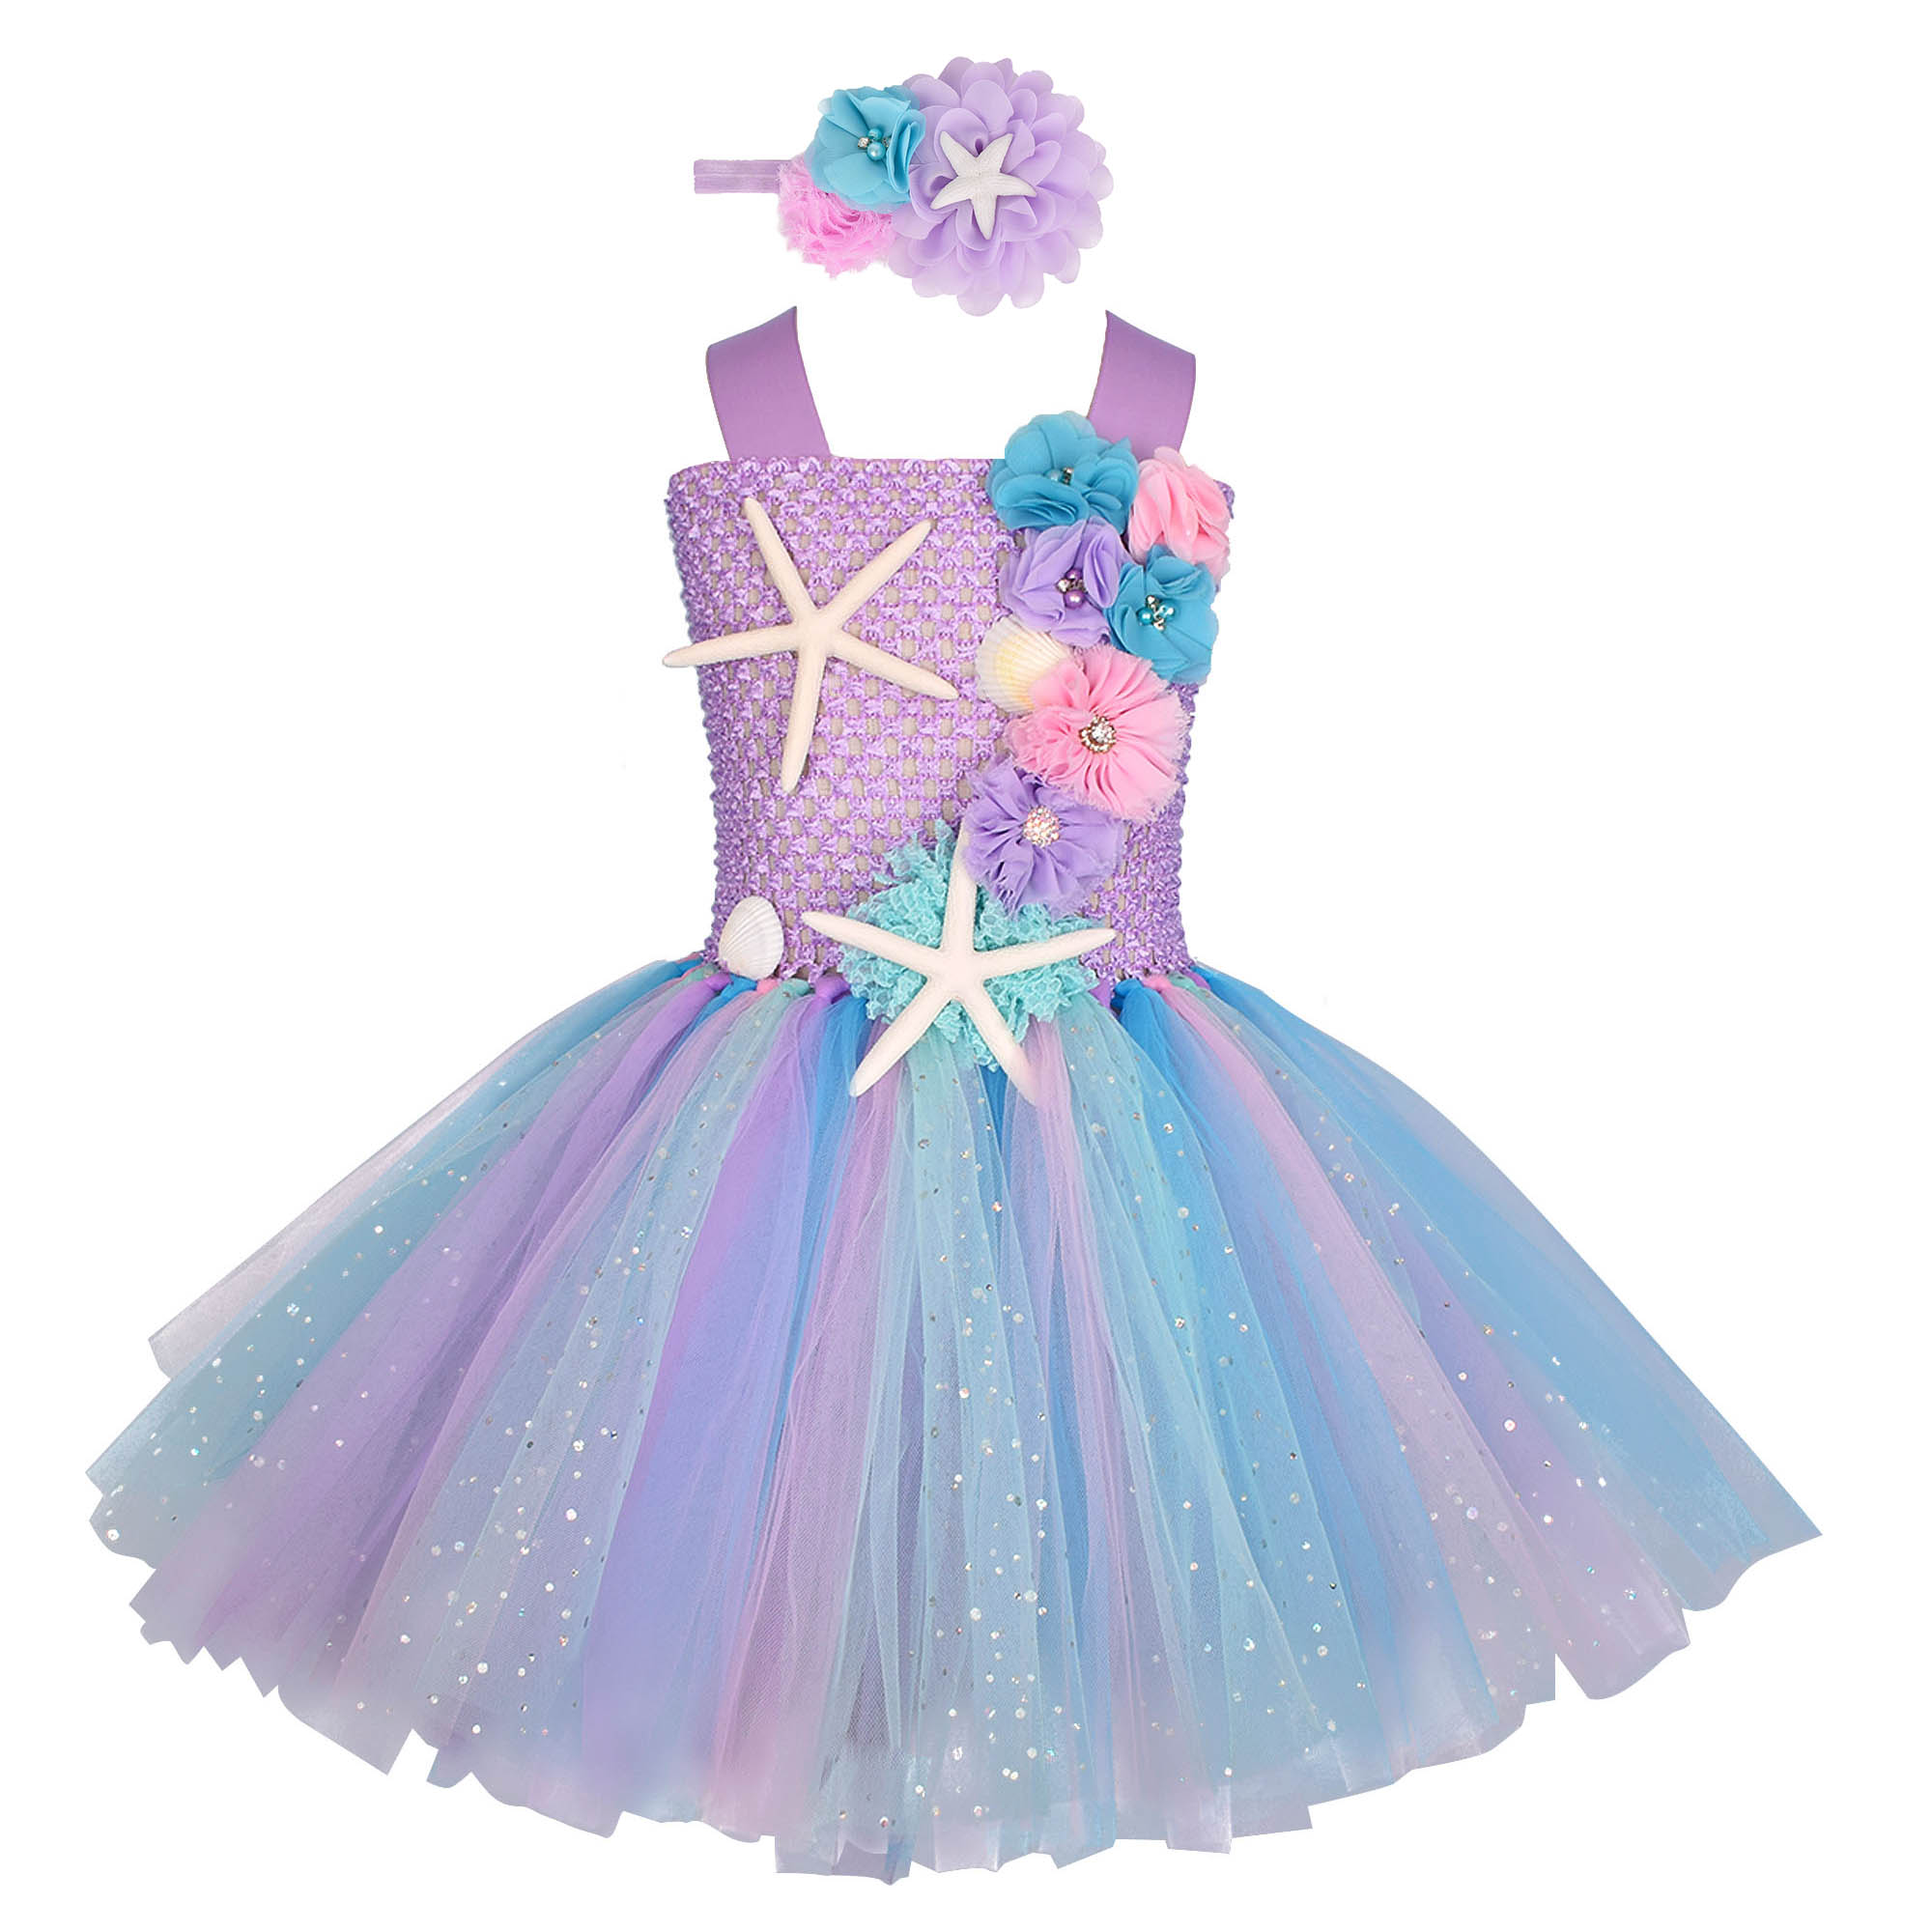 2PCS Birthday Pageant Toddler Girls Mermaid Dress Headband Costume Party Dress